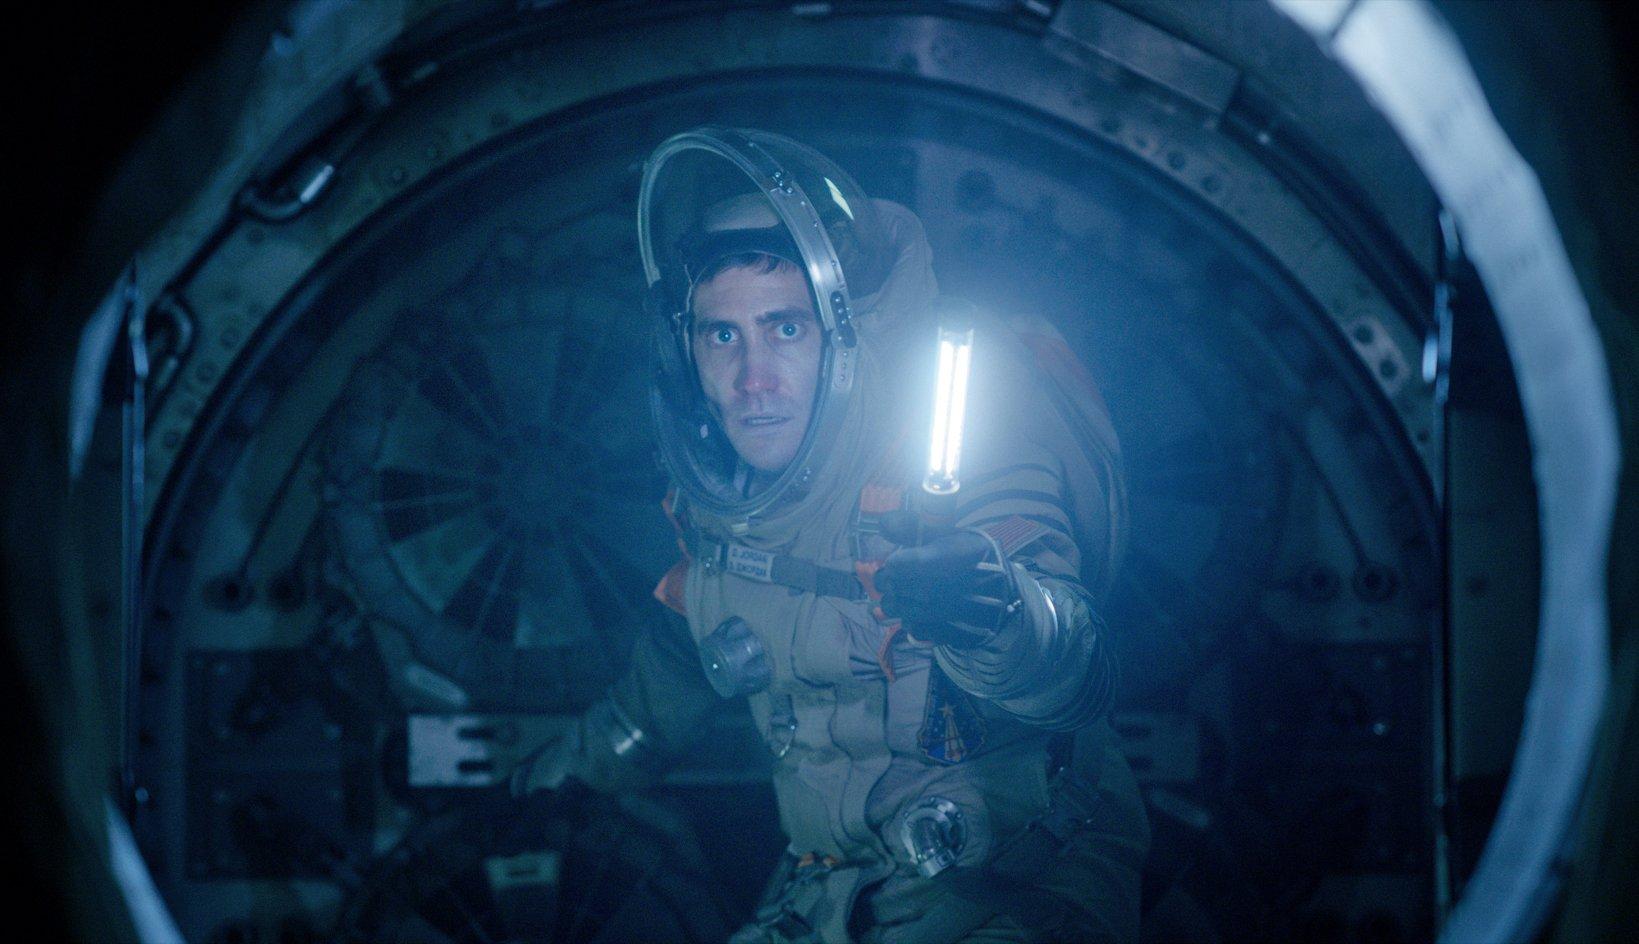 life science fiction alien horror movie sony pictures jake gyllenhaal 3